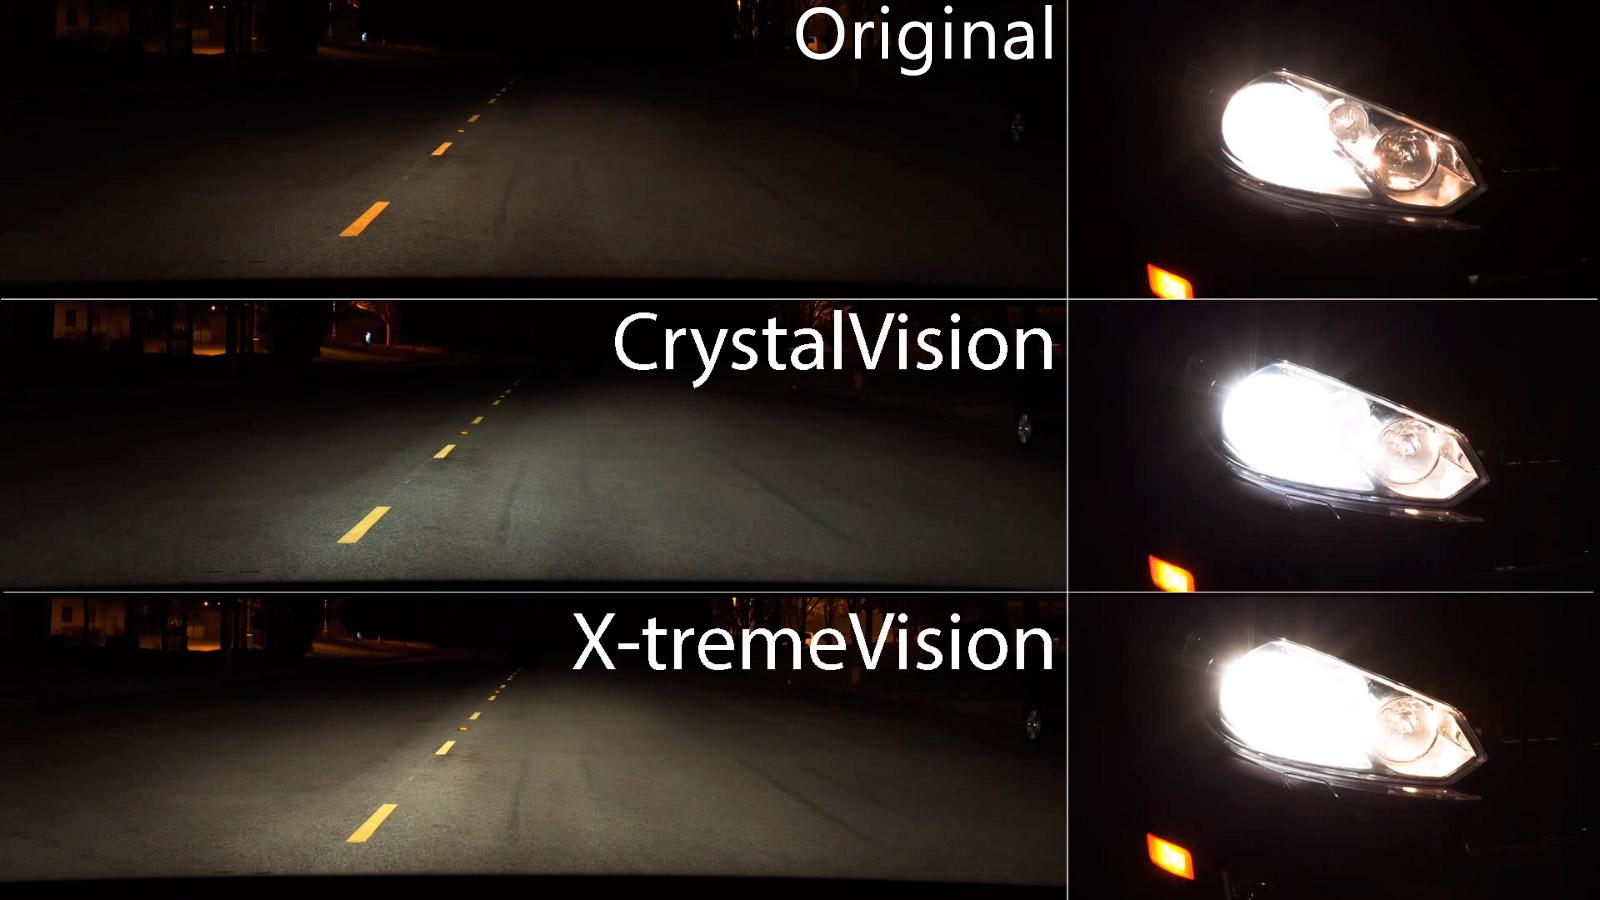 philips x-treme vision หลอดไฟหน้ารถยนต์ปลอดภัย (แต่หลอดซีนอน ระวังใช้ไม่ถูกต้อง มีโอกาสถูกจับได้ )